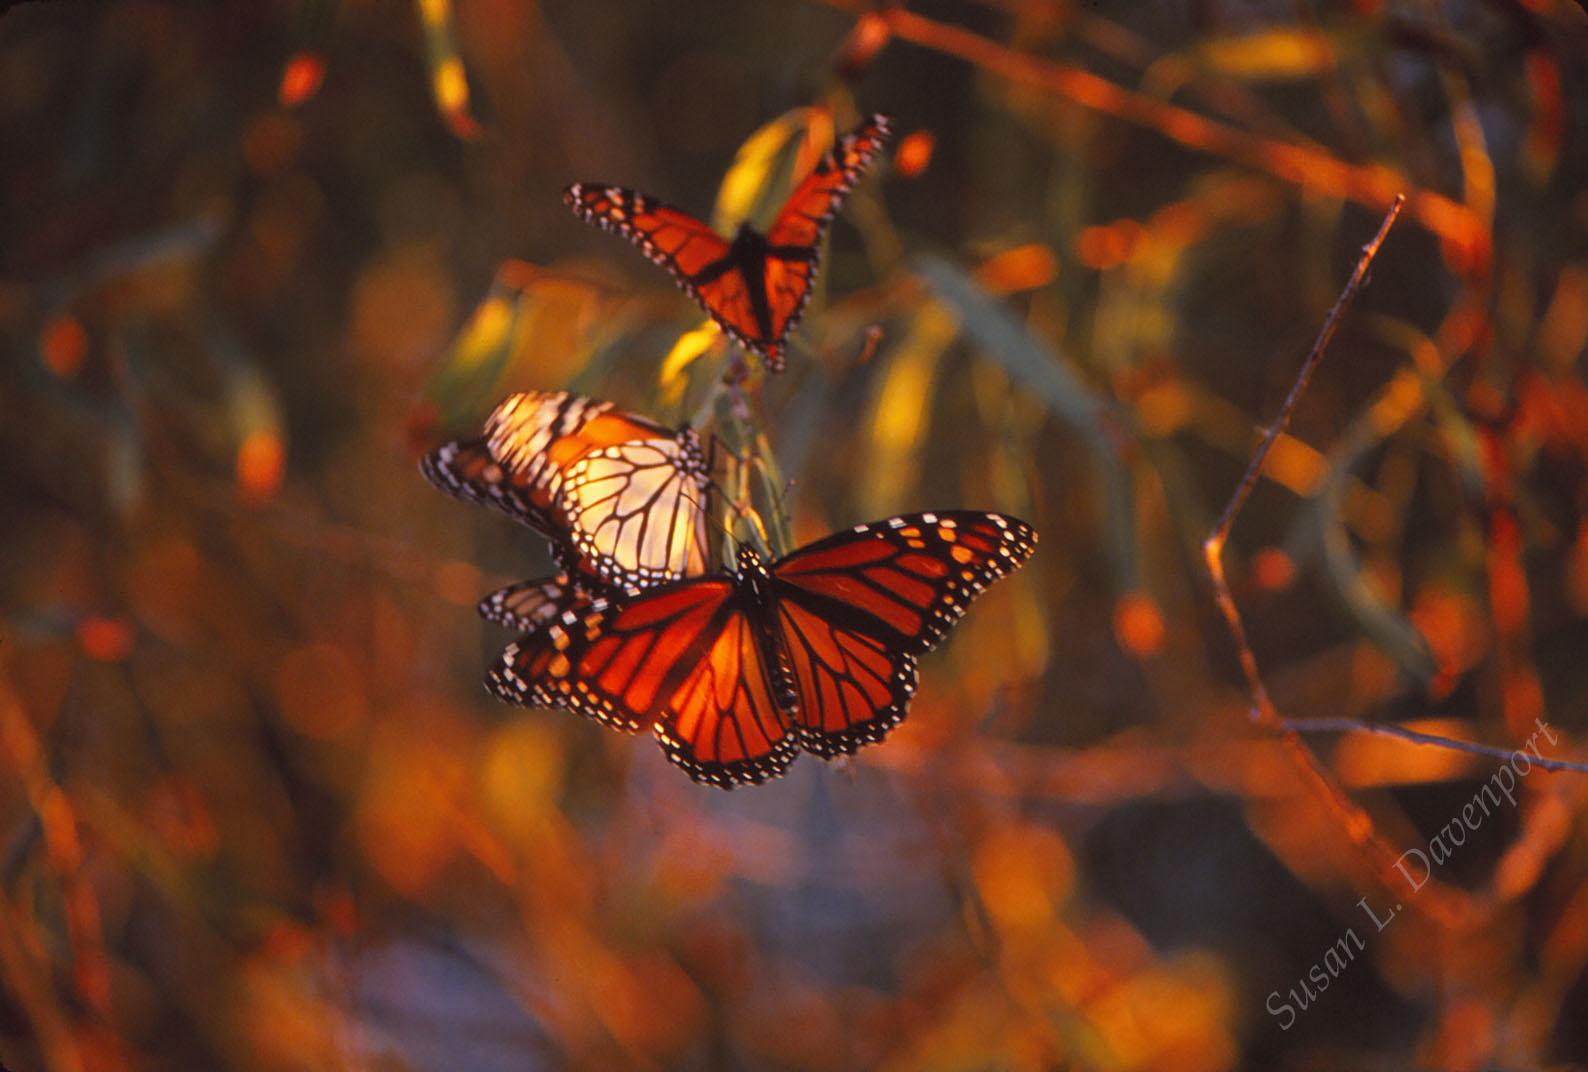 Monarch Migration, San Bernard Game Preserve - Photo by Susan L. Davenport